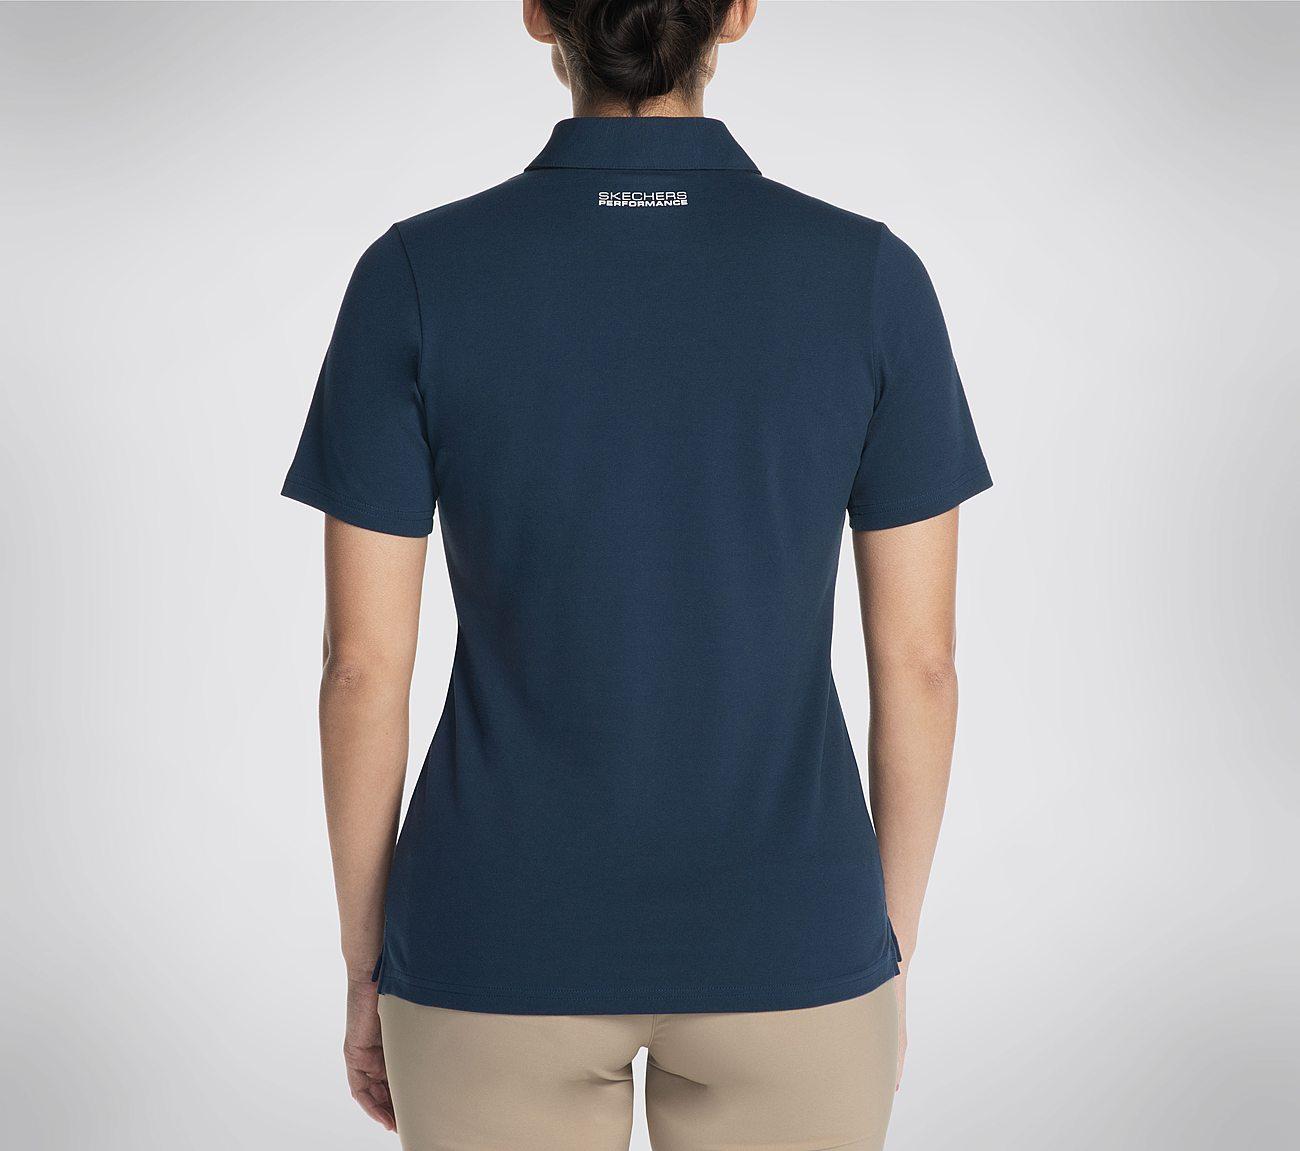 Skechers GO GOLF Comfort Swing Pocket Polo Shirt